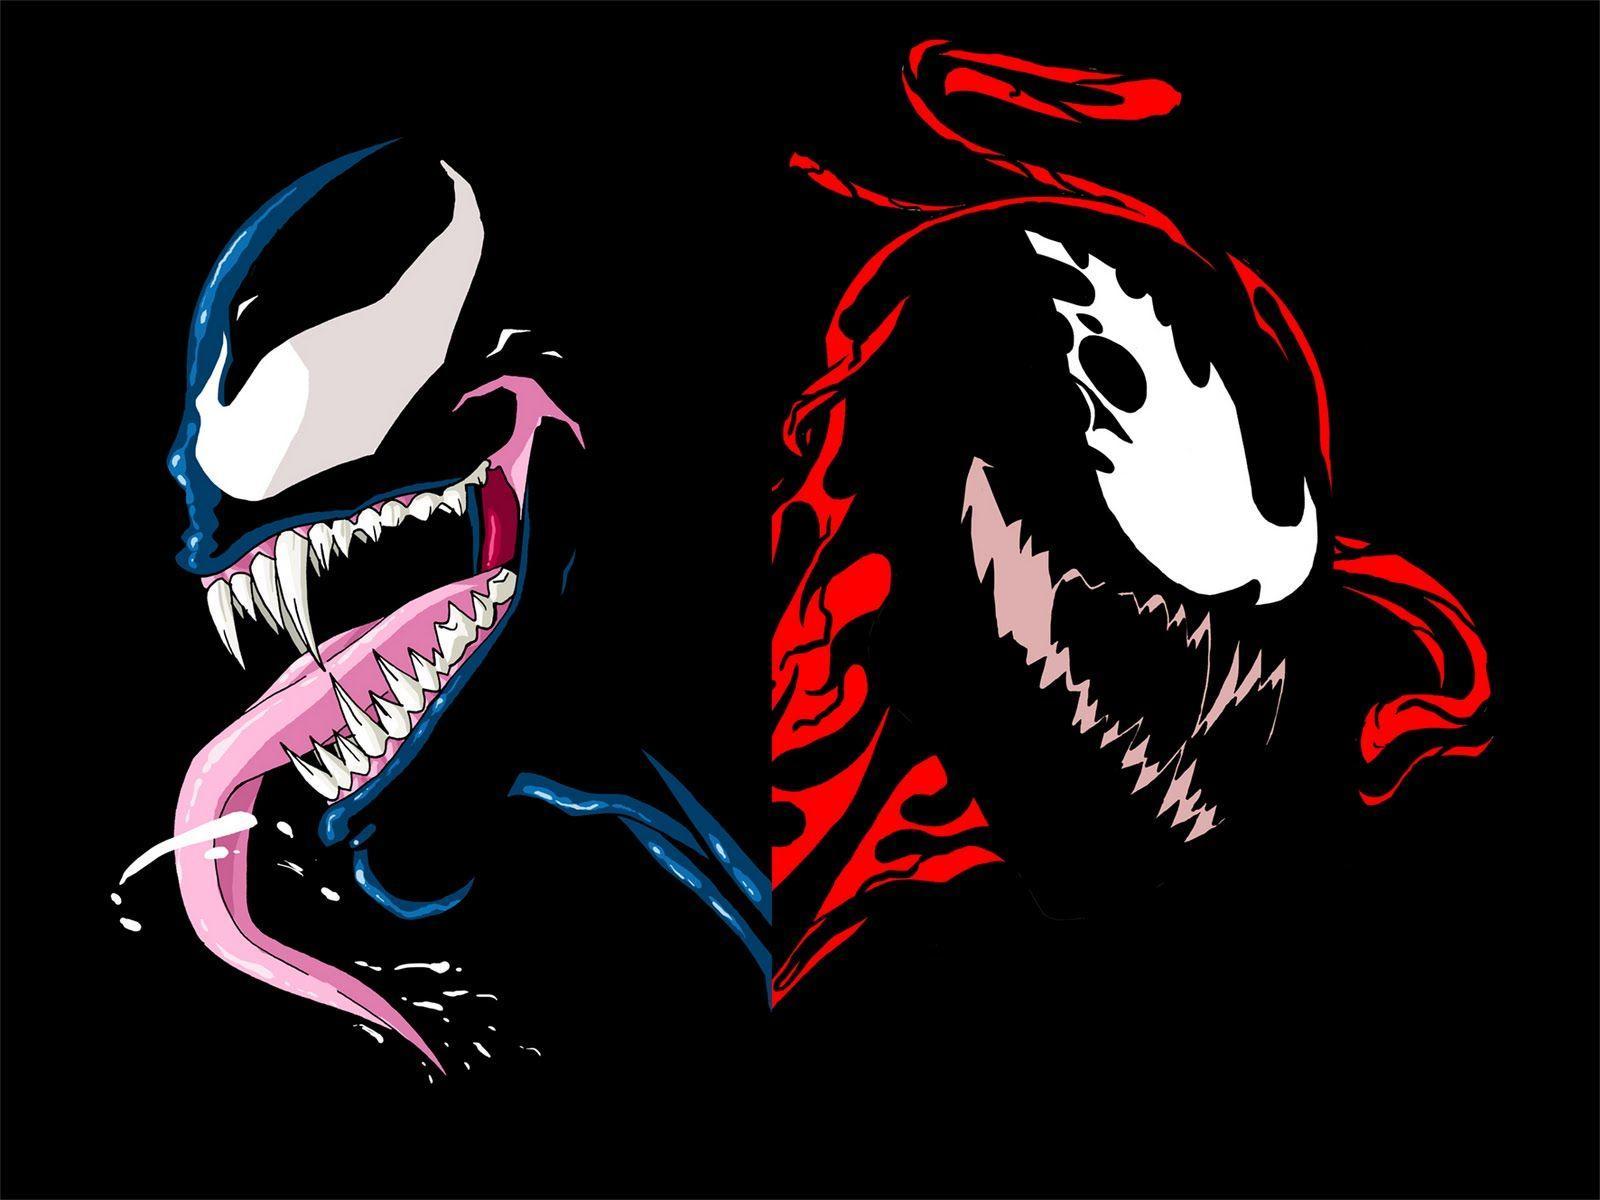 venom wallpaper hd 1920x1080 - photo #20